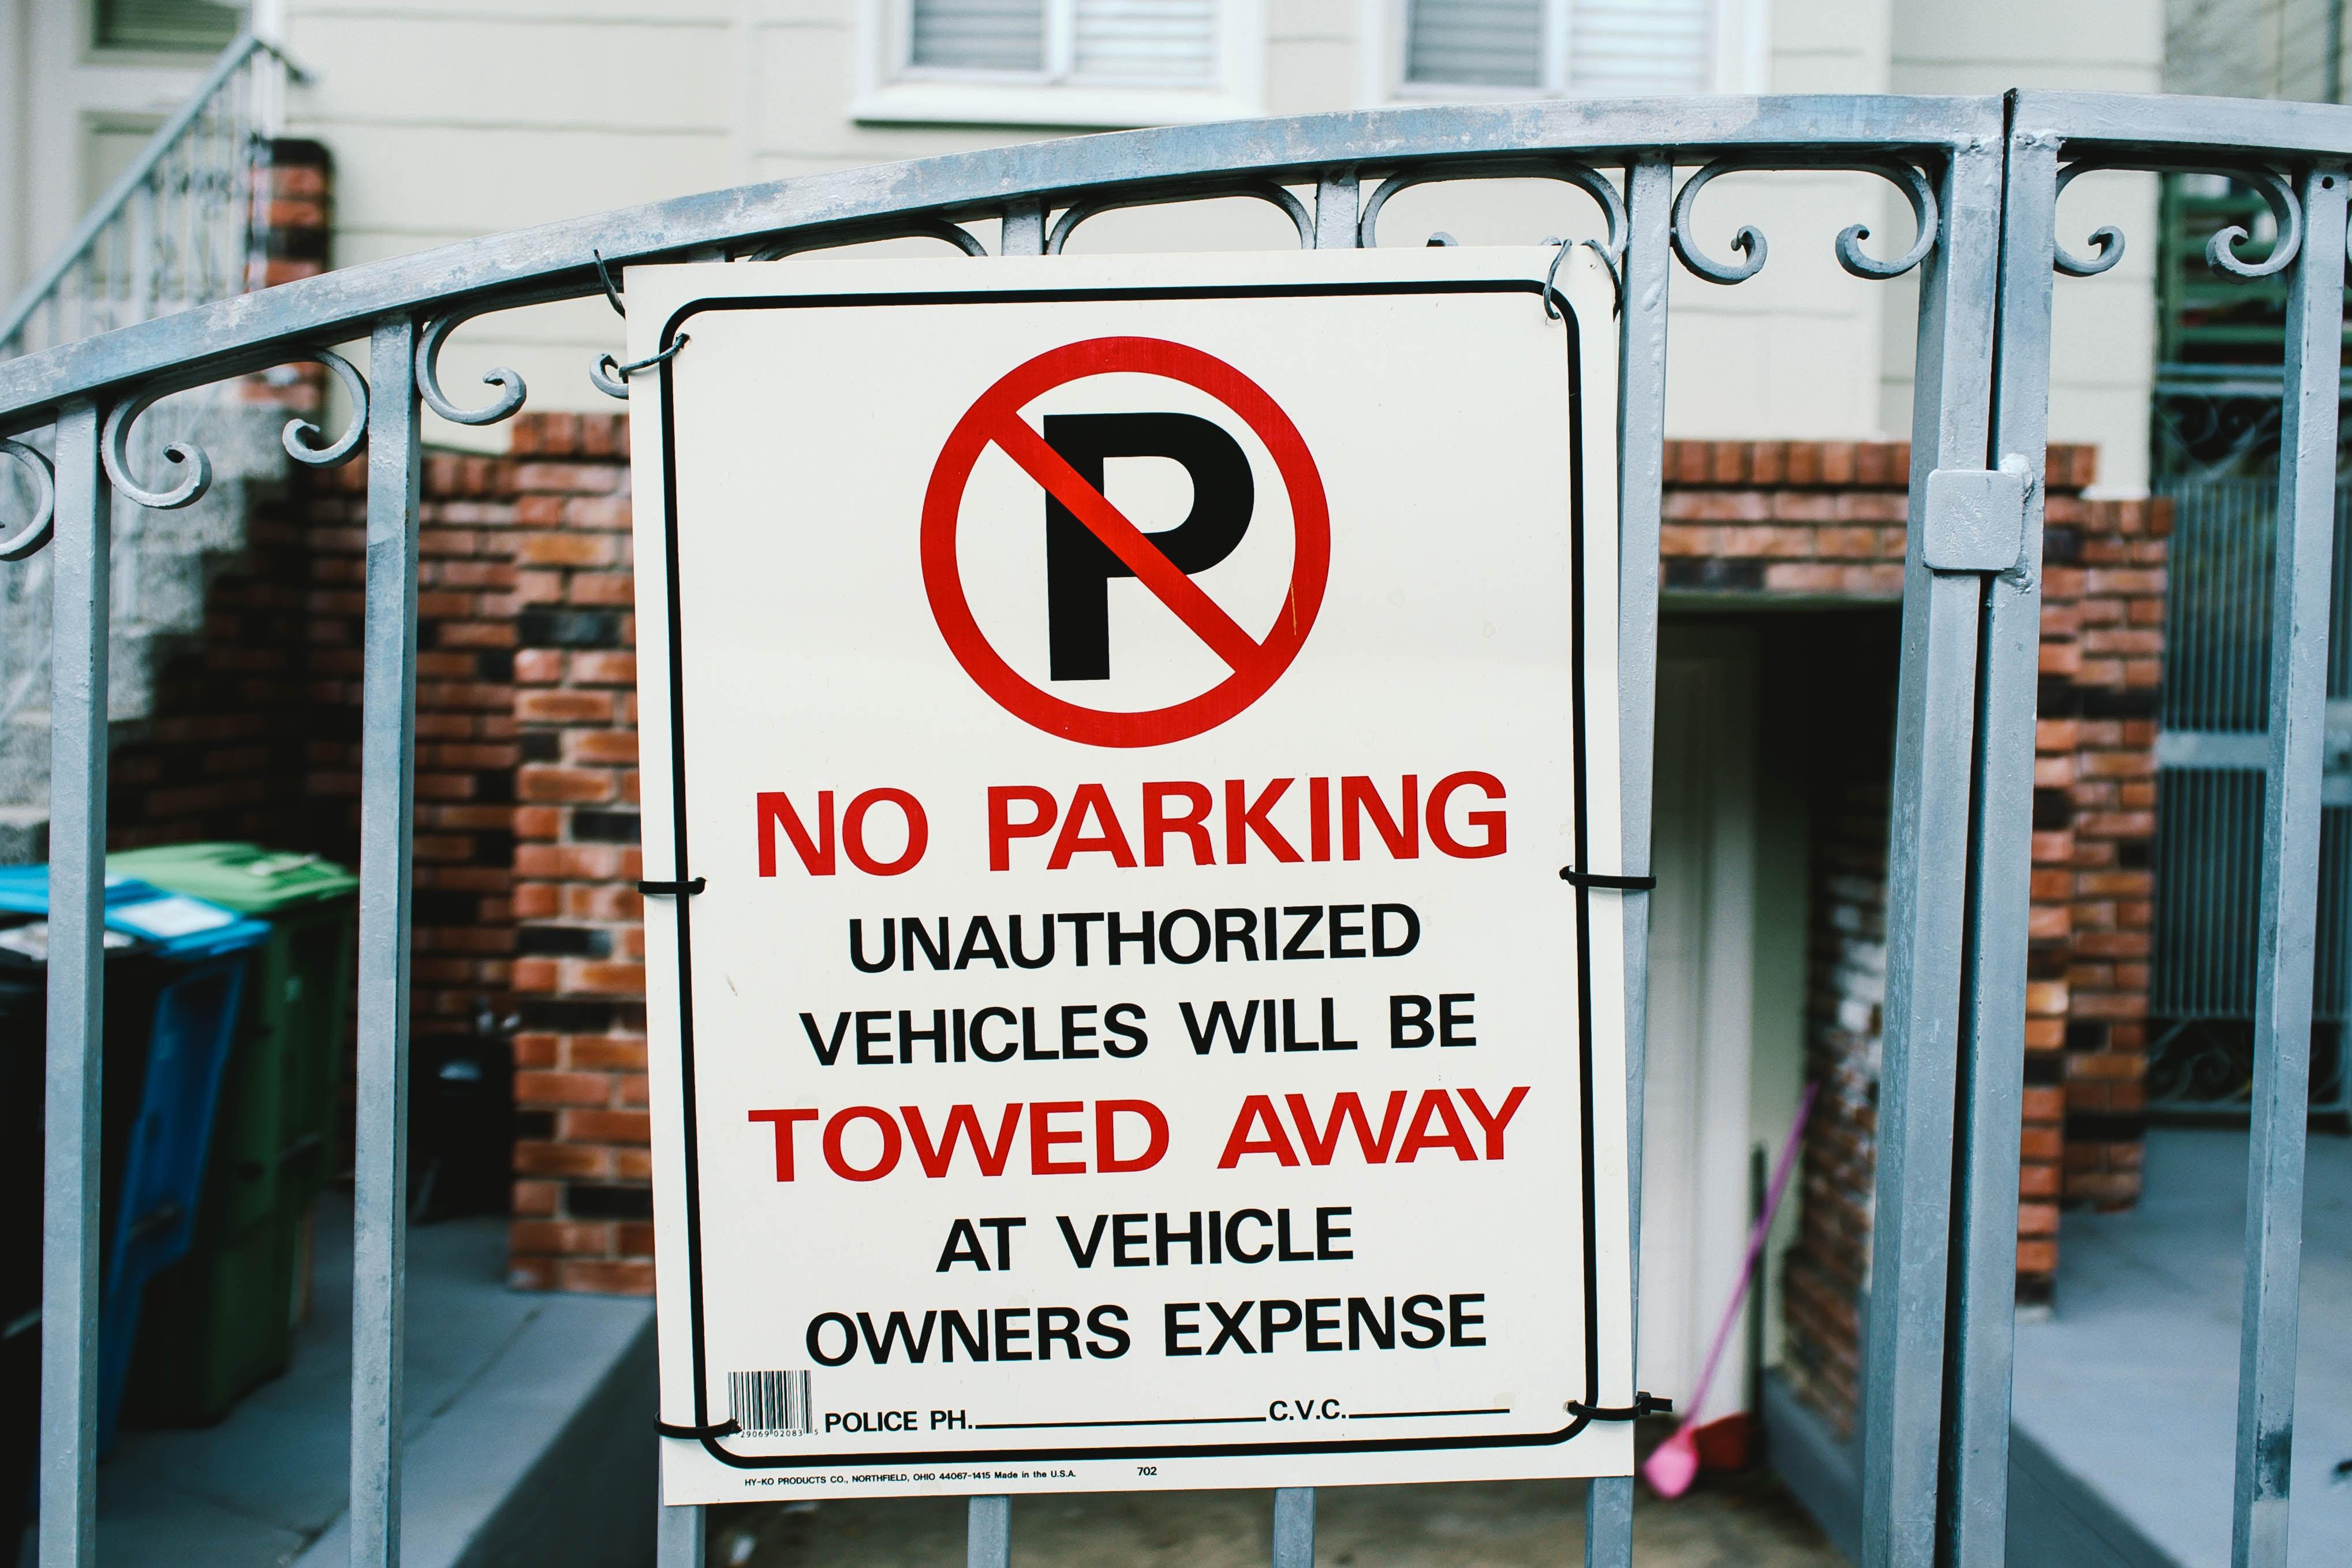 no parking signage on gate